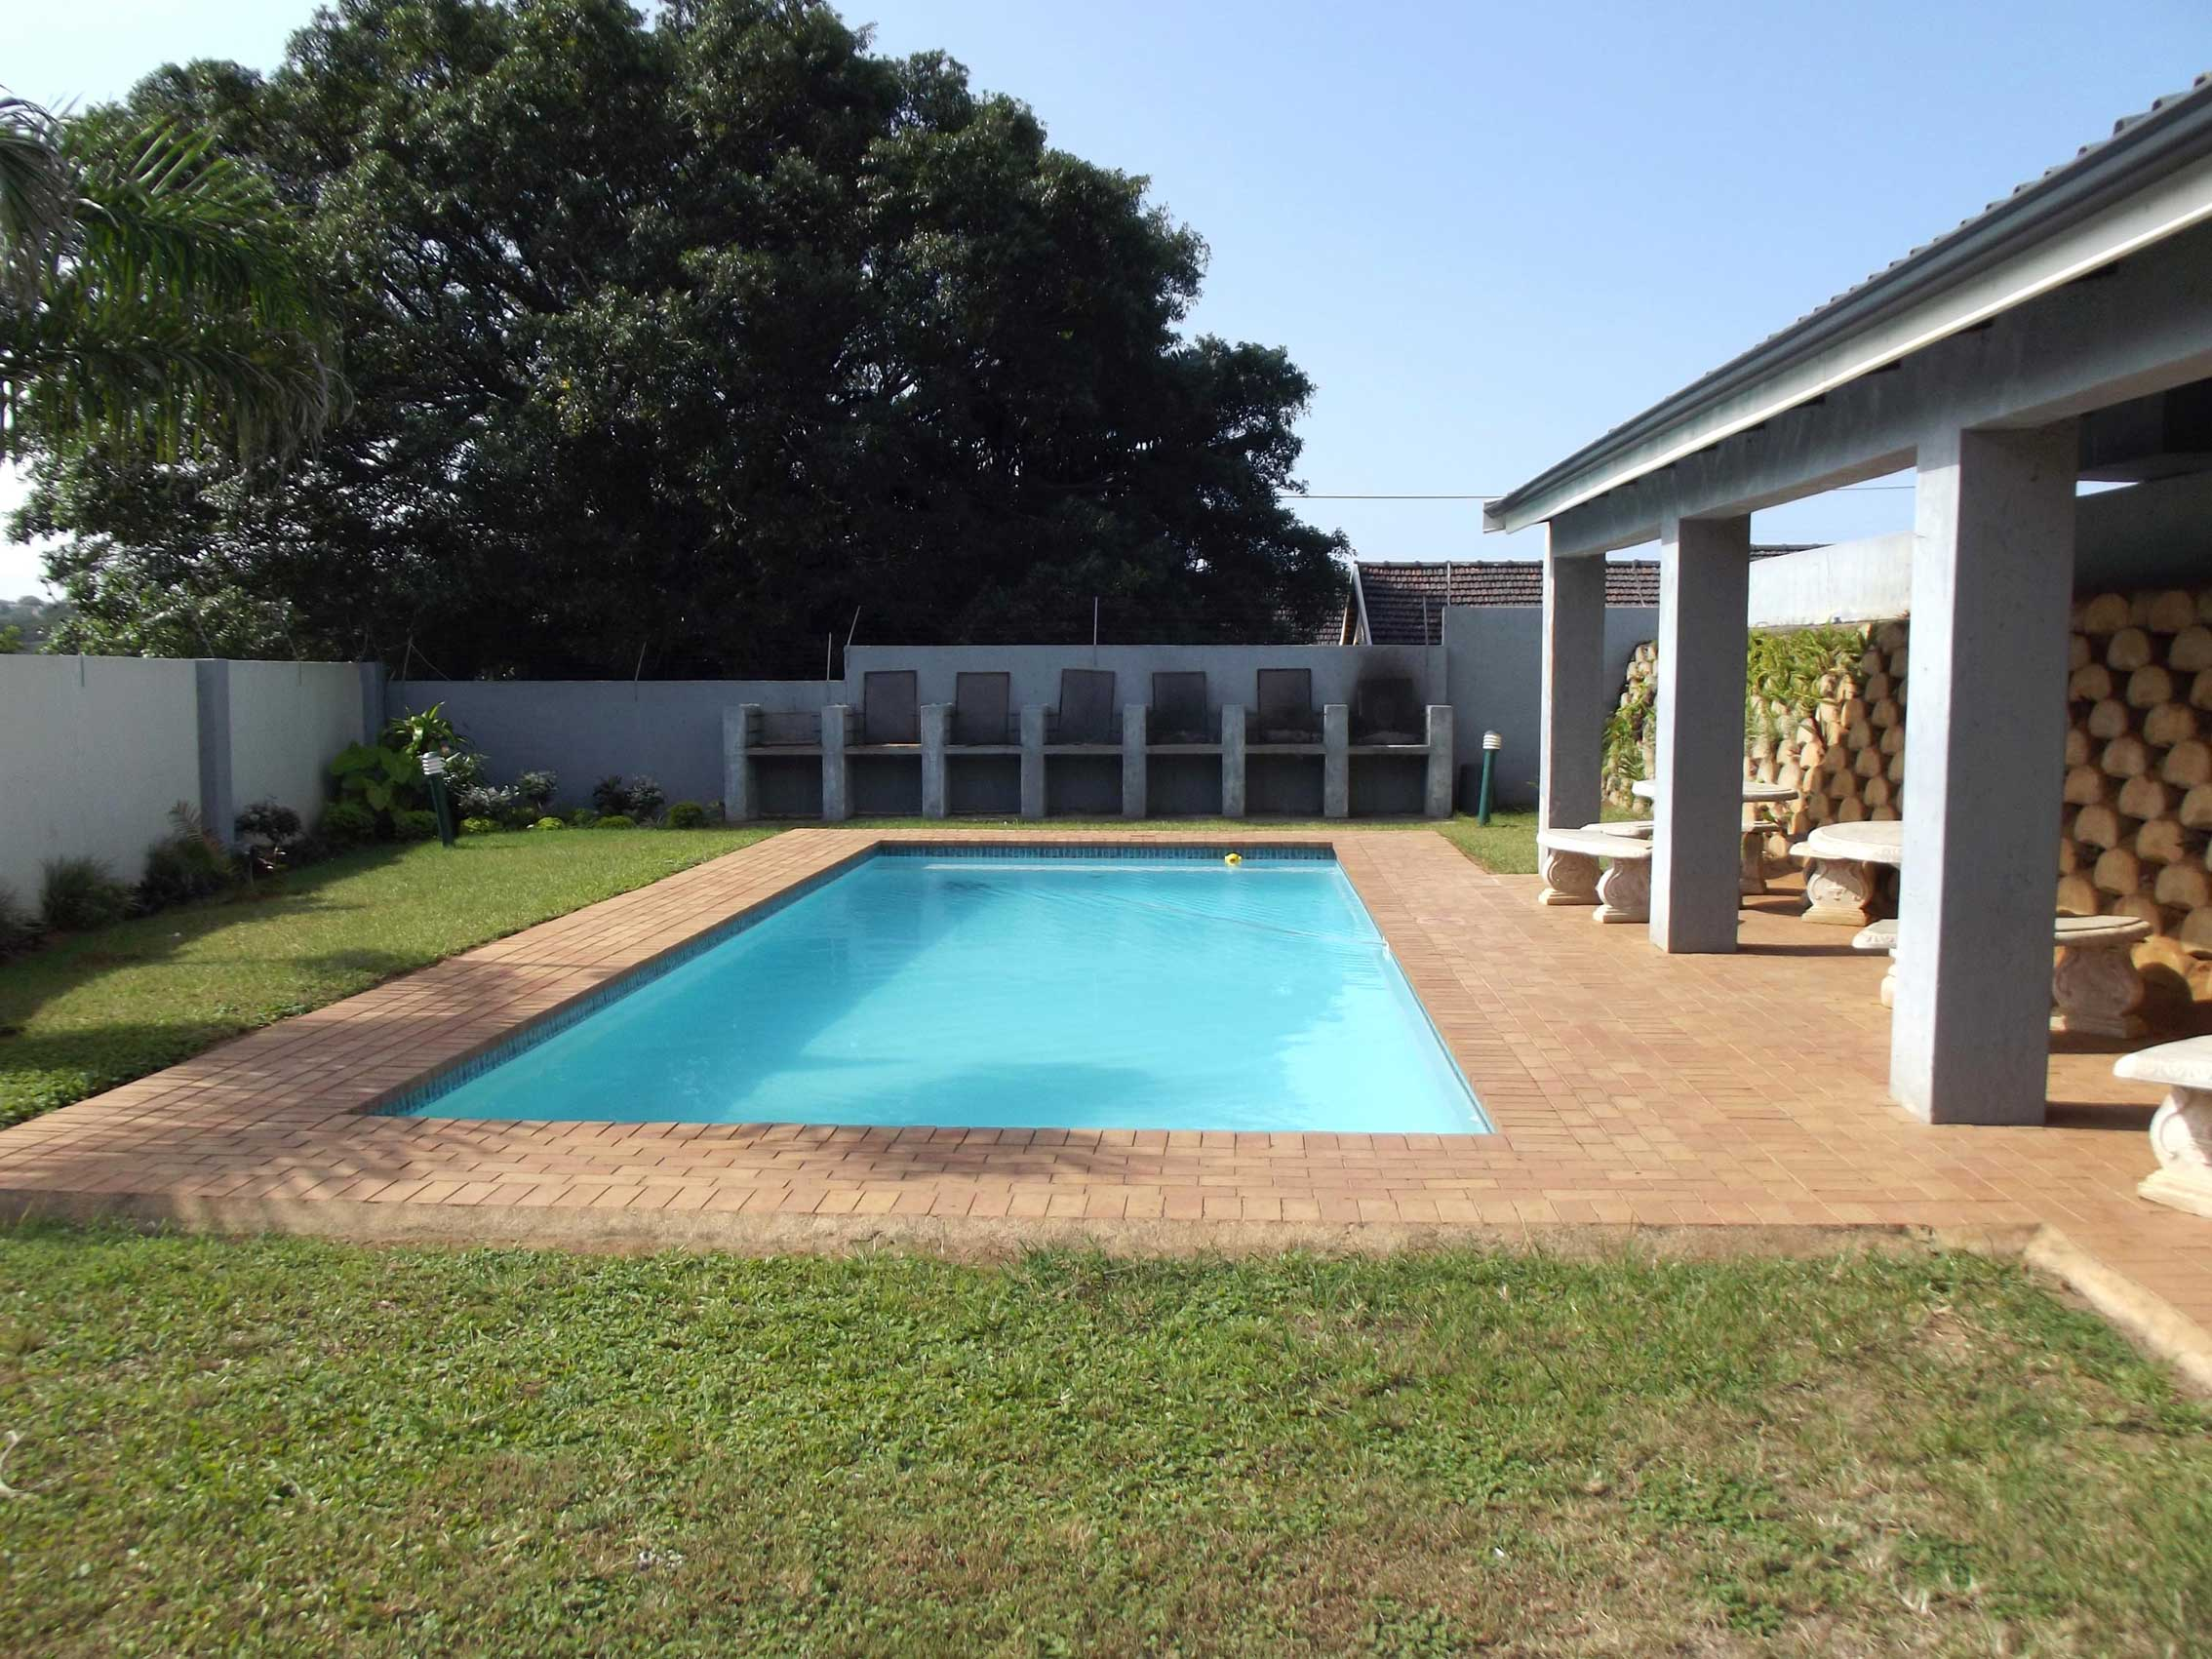 Villa Cordoba 24 - St Michaels On Sea - Self Catering - Accommodation - Sleeps 6